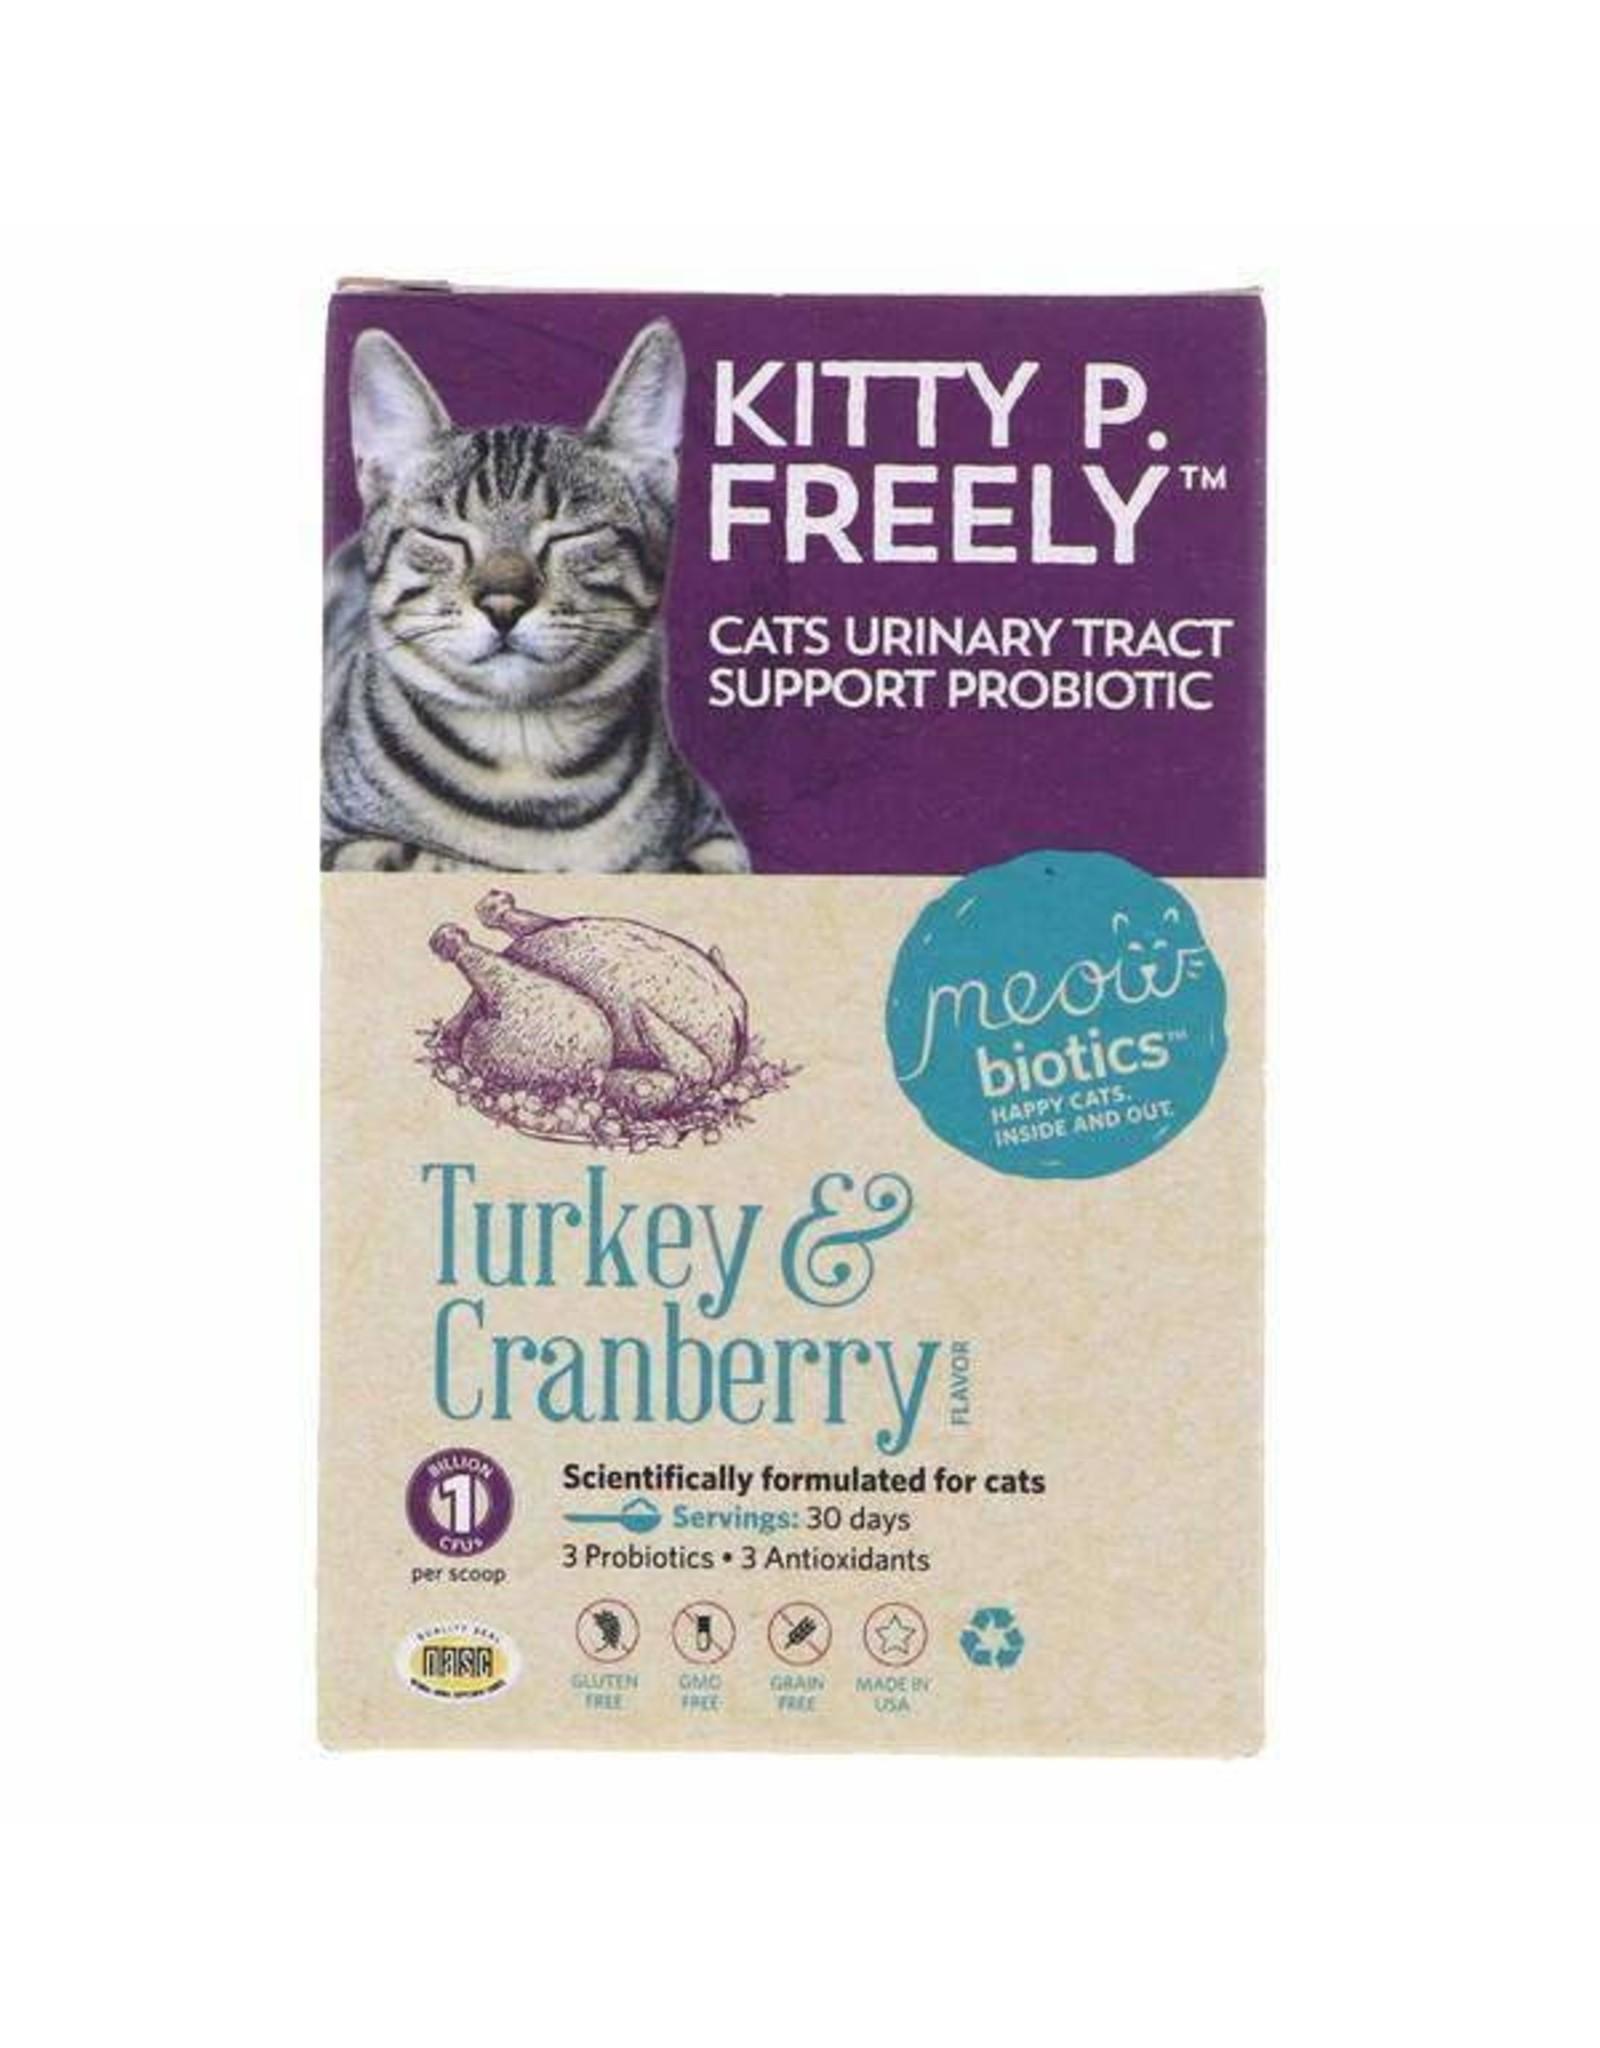 Fidobiotics Meowbiotic: Kitty P. Freely